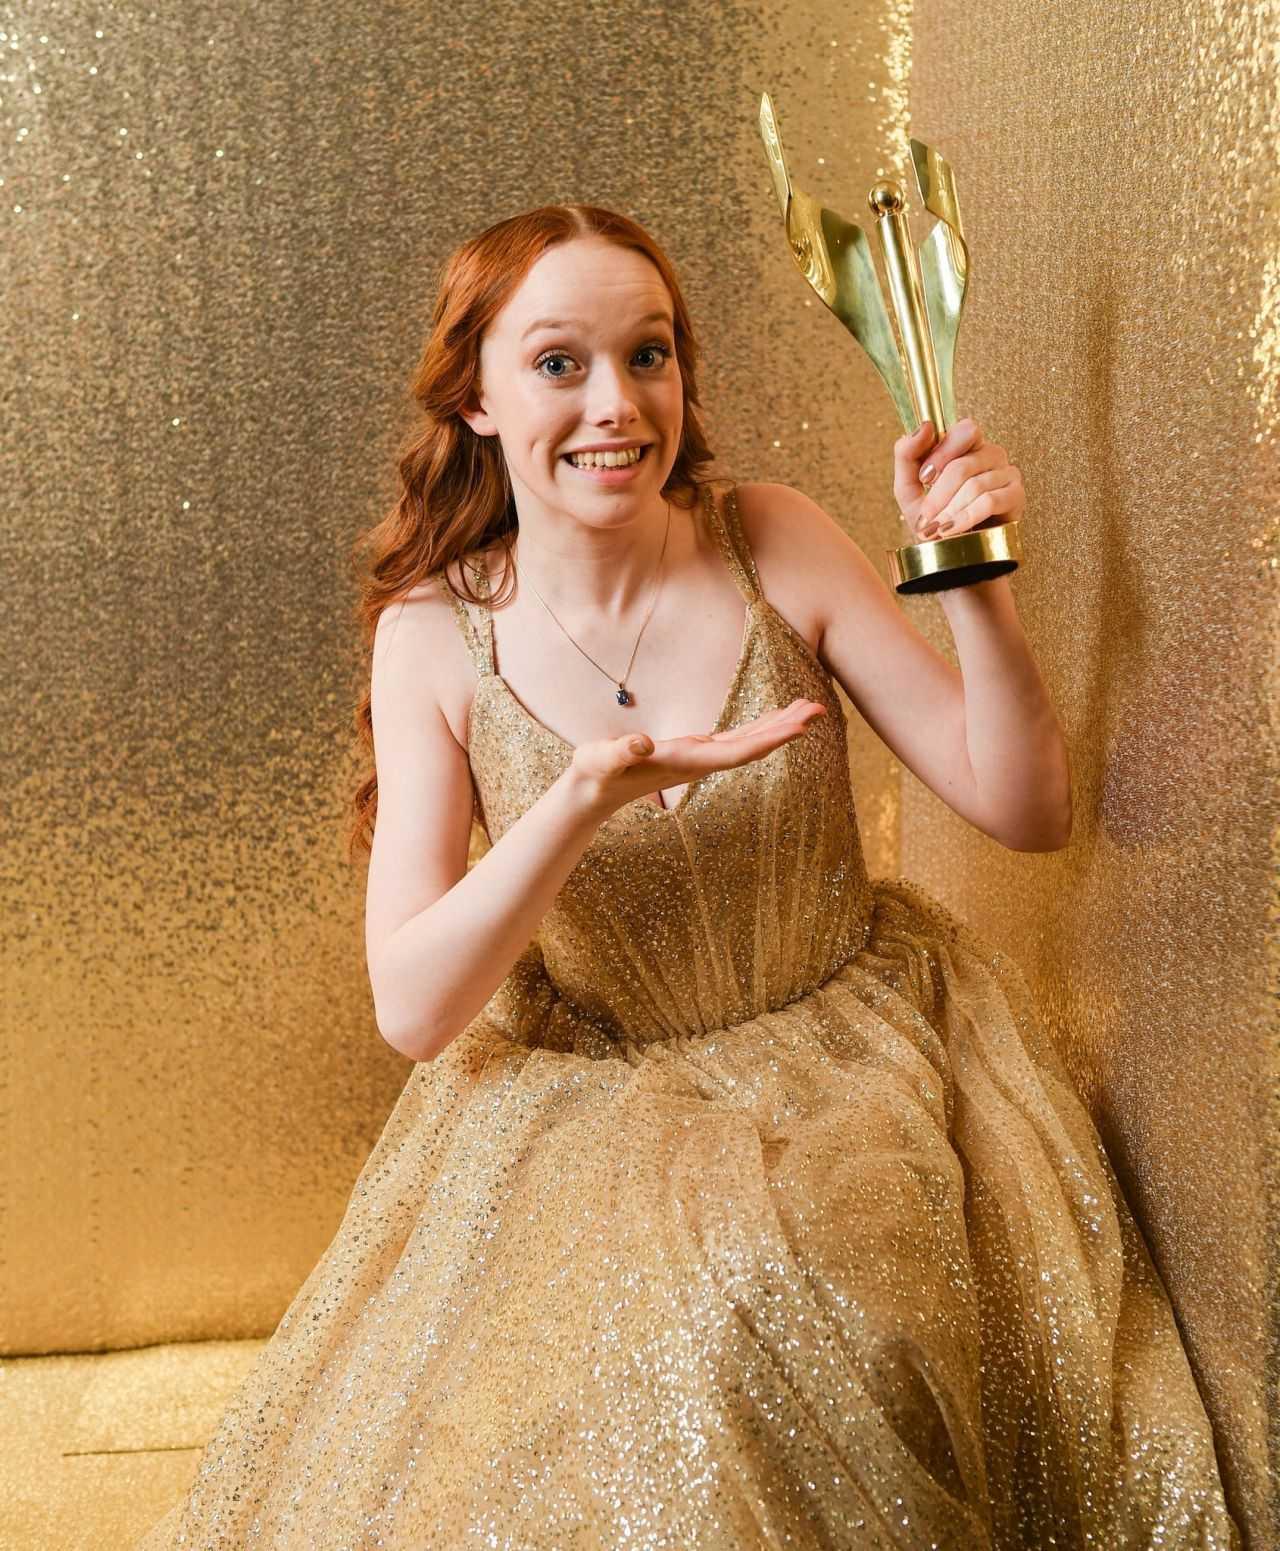 amybeth-mcnulty-2019-canadian-screen-awards-broadcast-gala-photoshoot-4